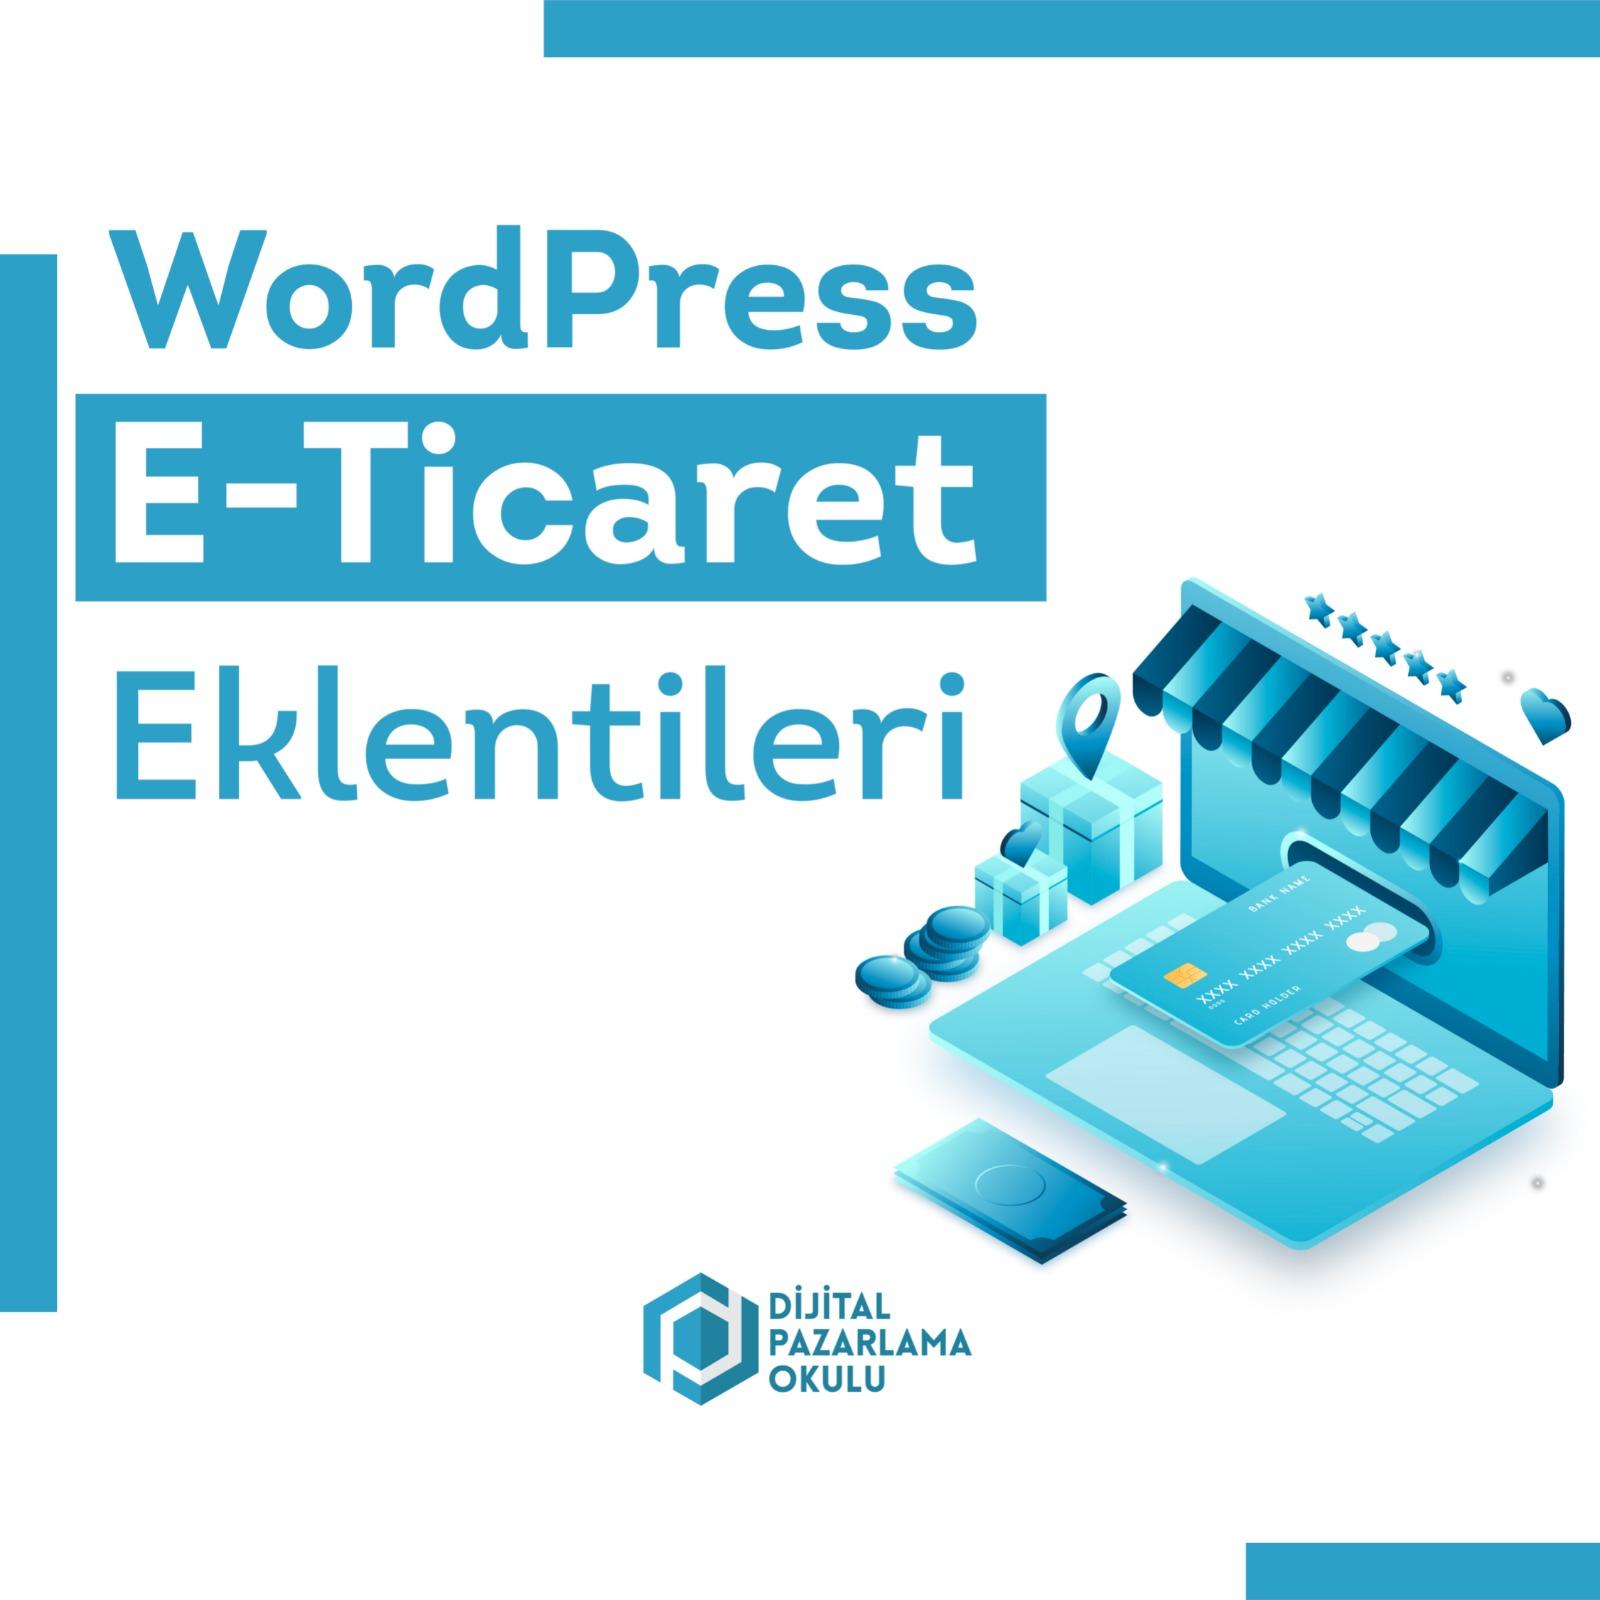 WordPress E-Ticaret Eklentileri